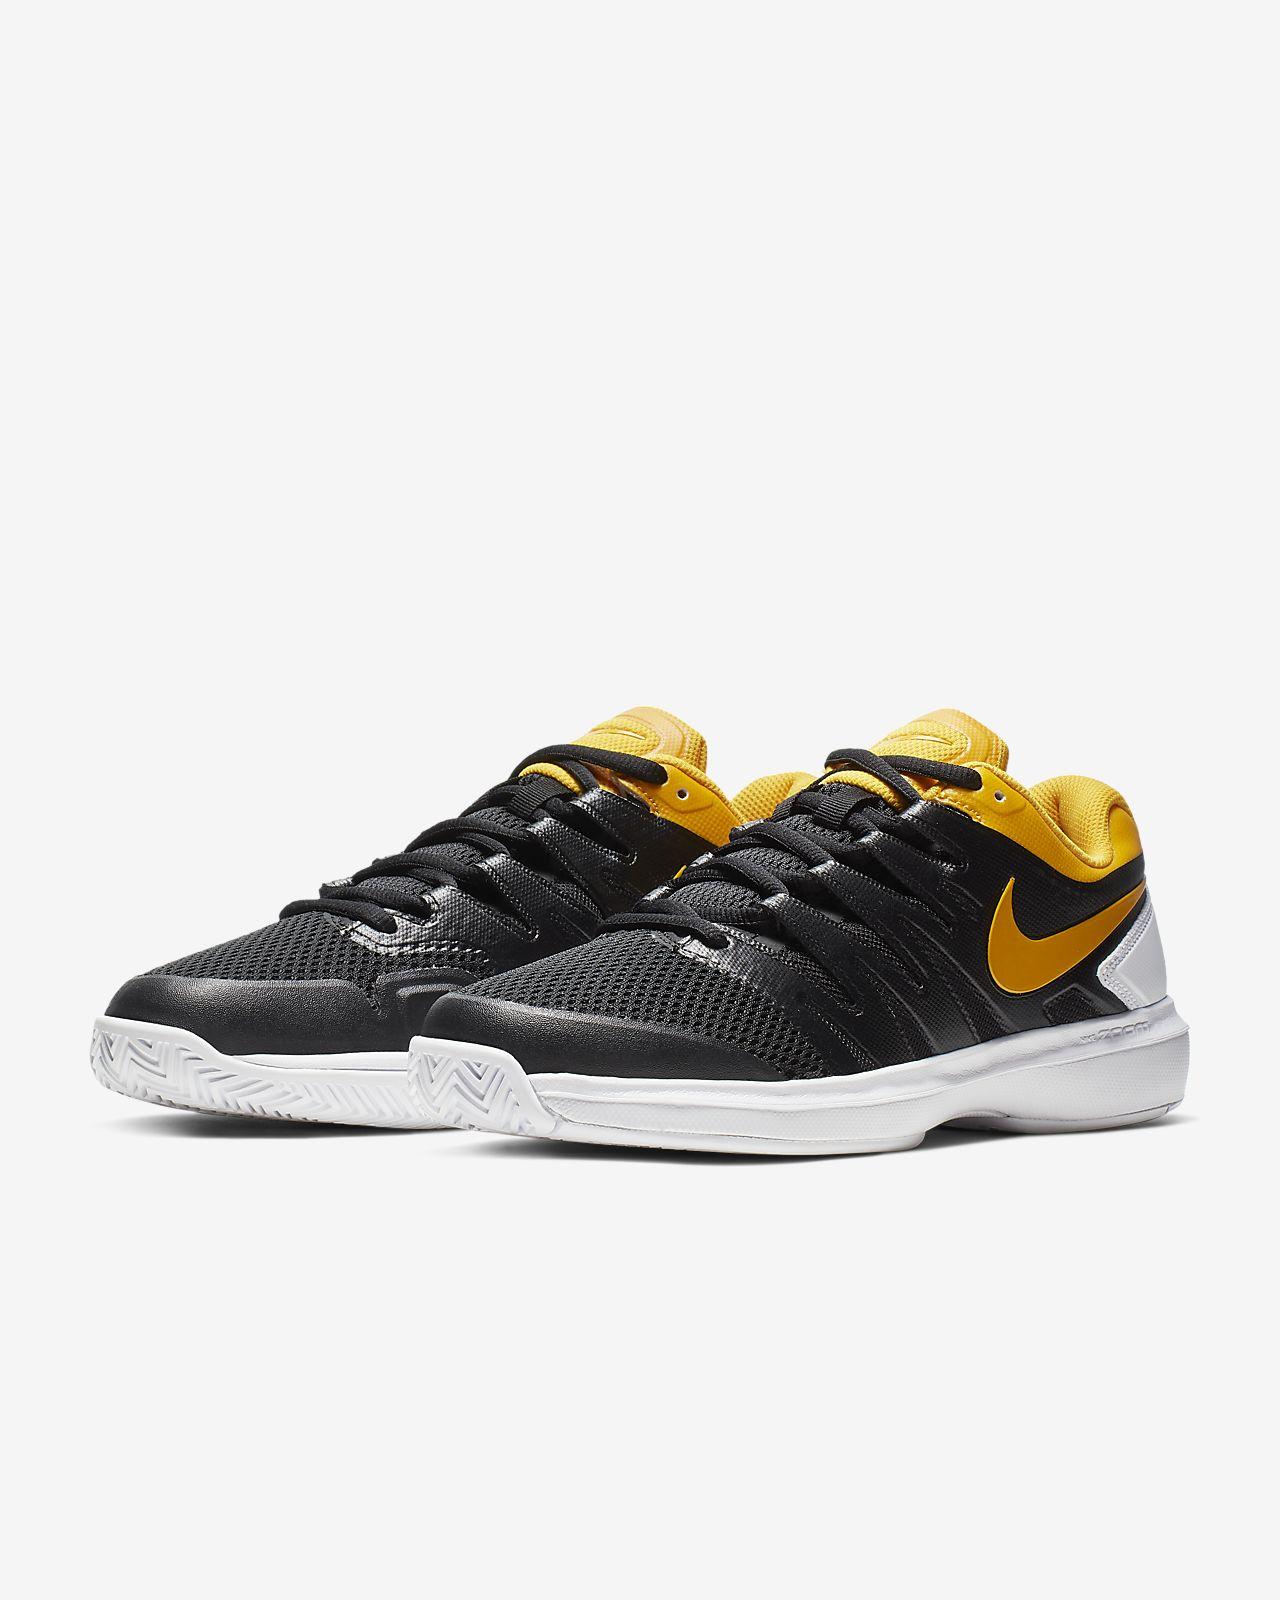 85e4d82272fb43 NikeCourt Air Zoom Prestige Men's Hard Court Tennis Shoe. Nike.com